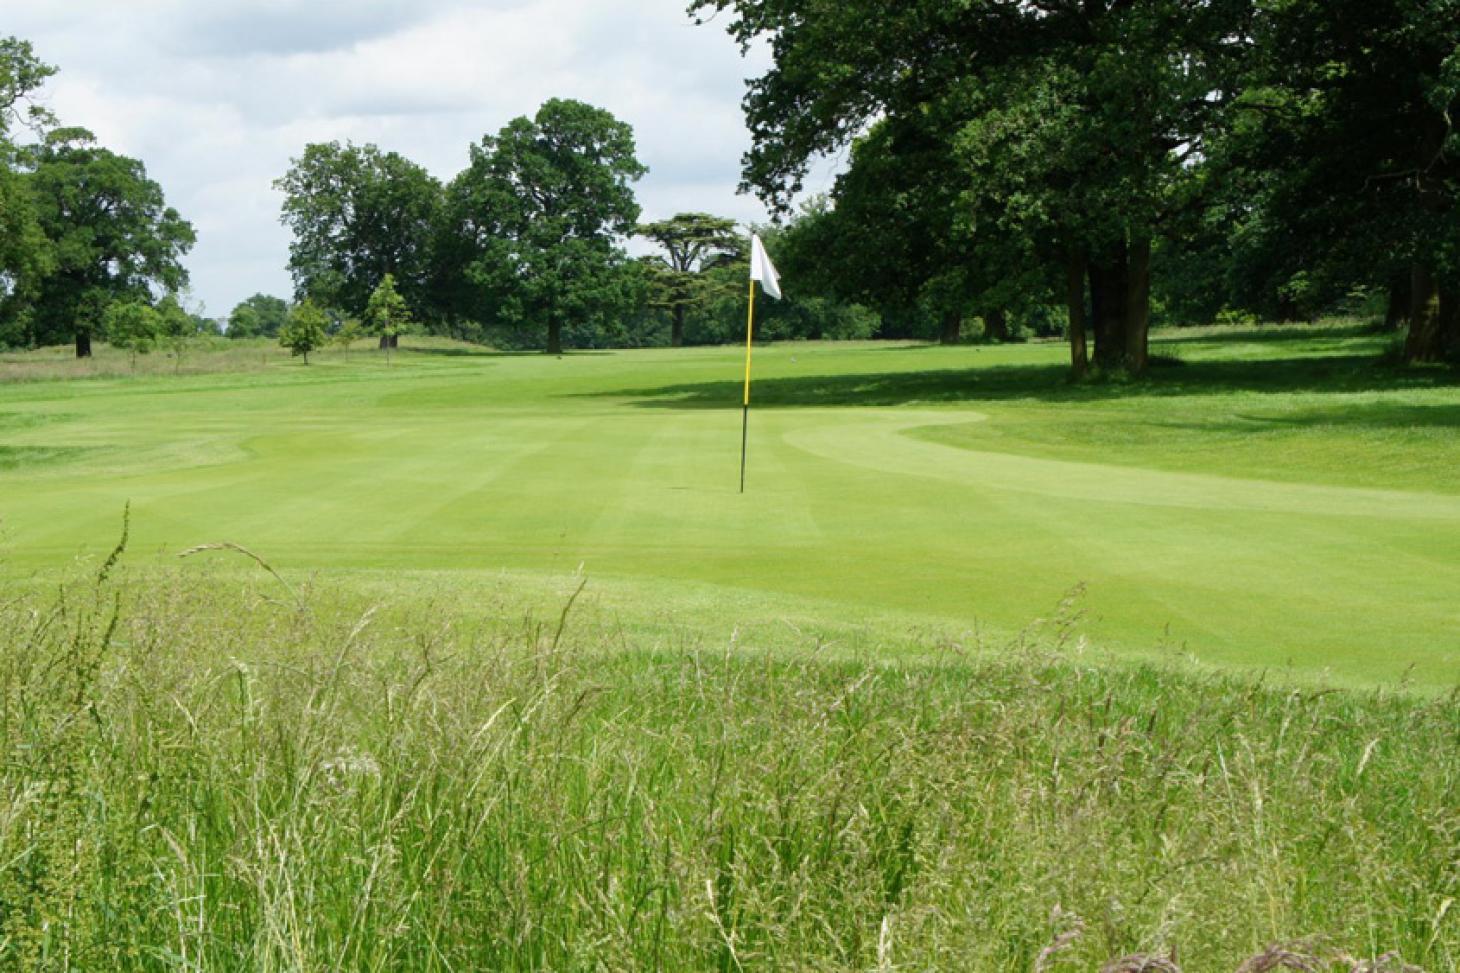 Luton Hoo Hotel Golf and Spa 18 hole golf course